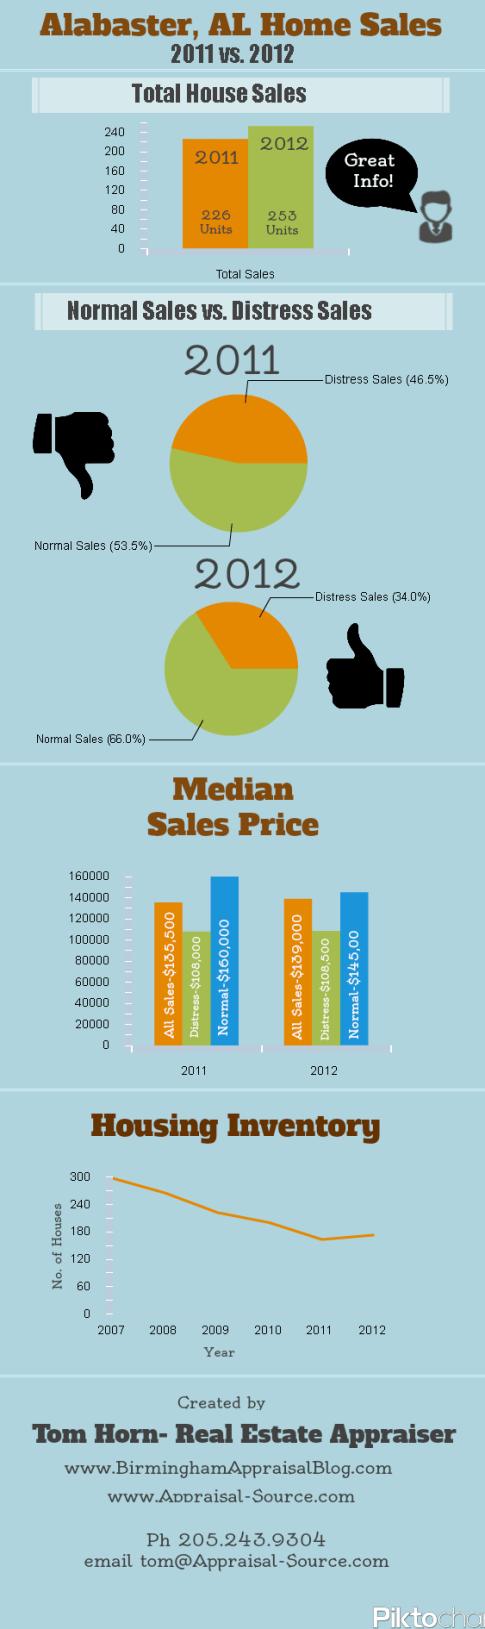 Alabaster Home Sales Infographic